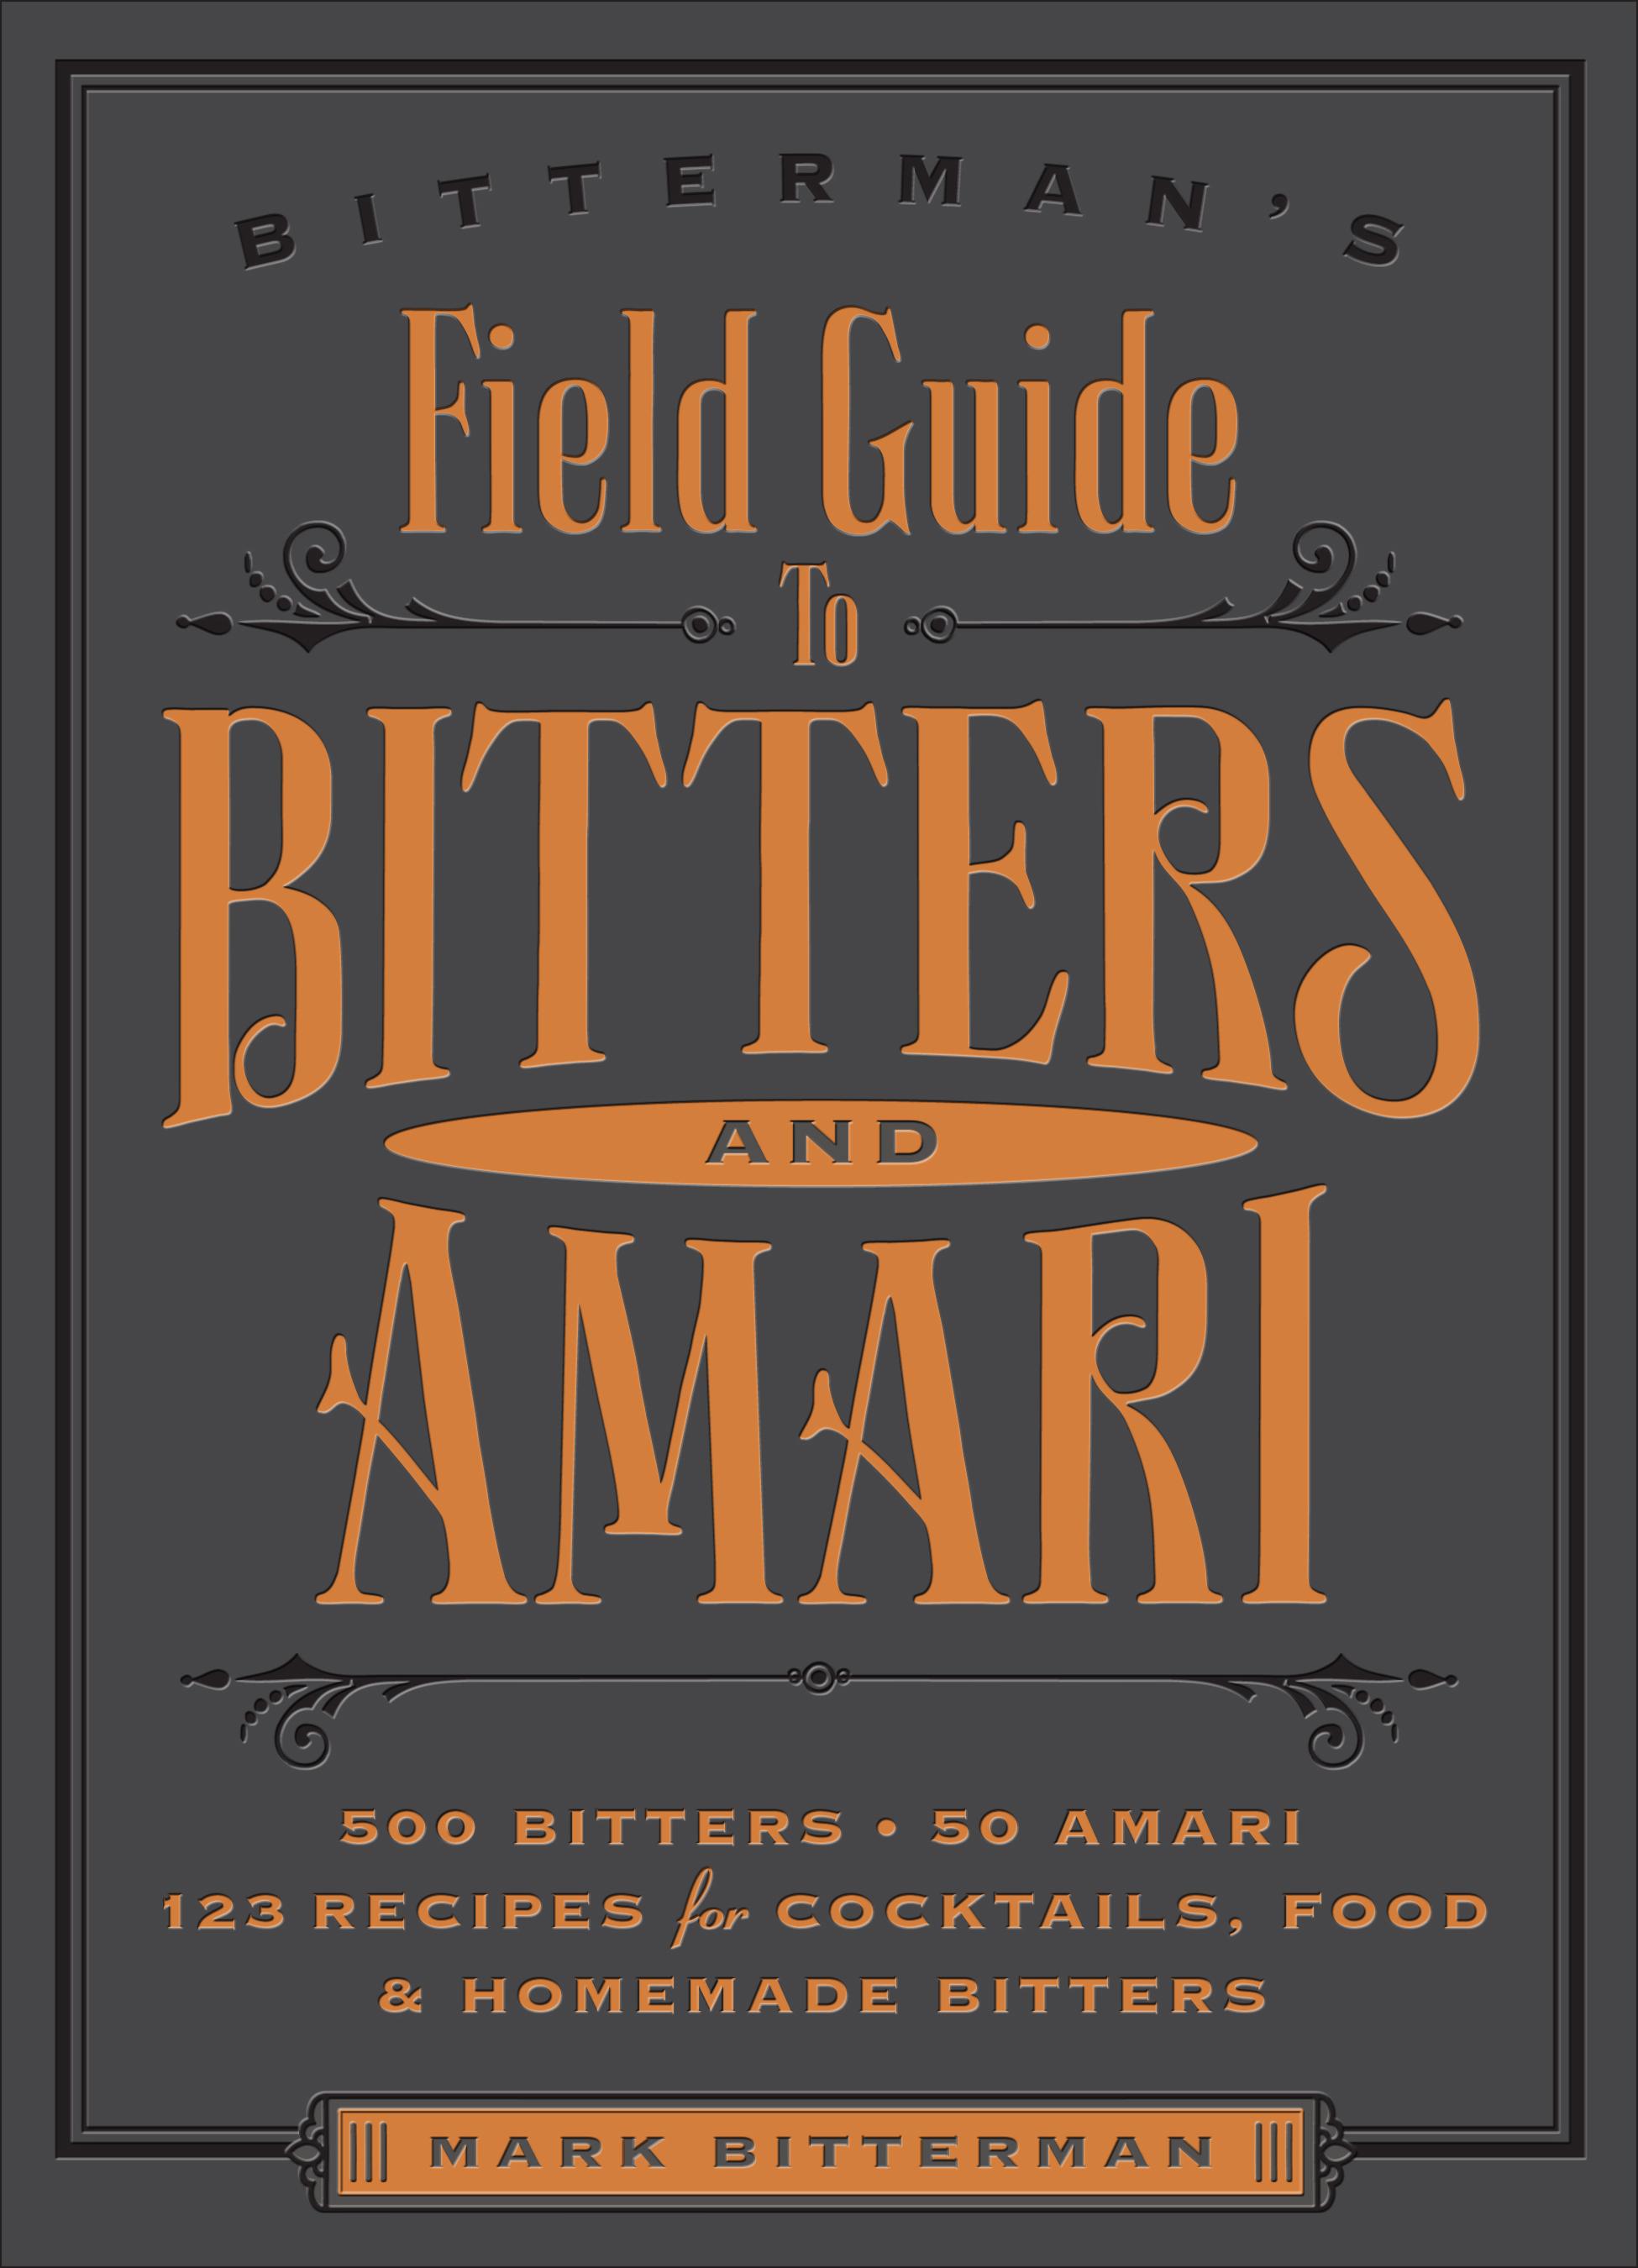 Bitterman's Field Guide to Bitters & Amar